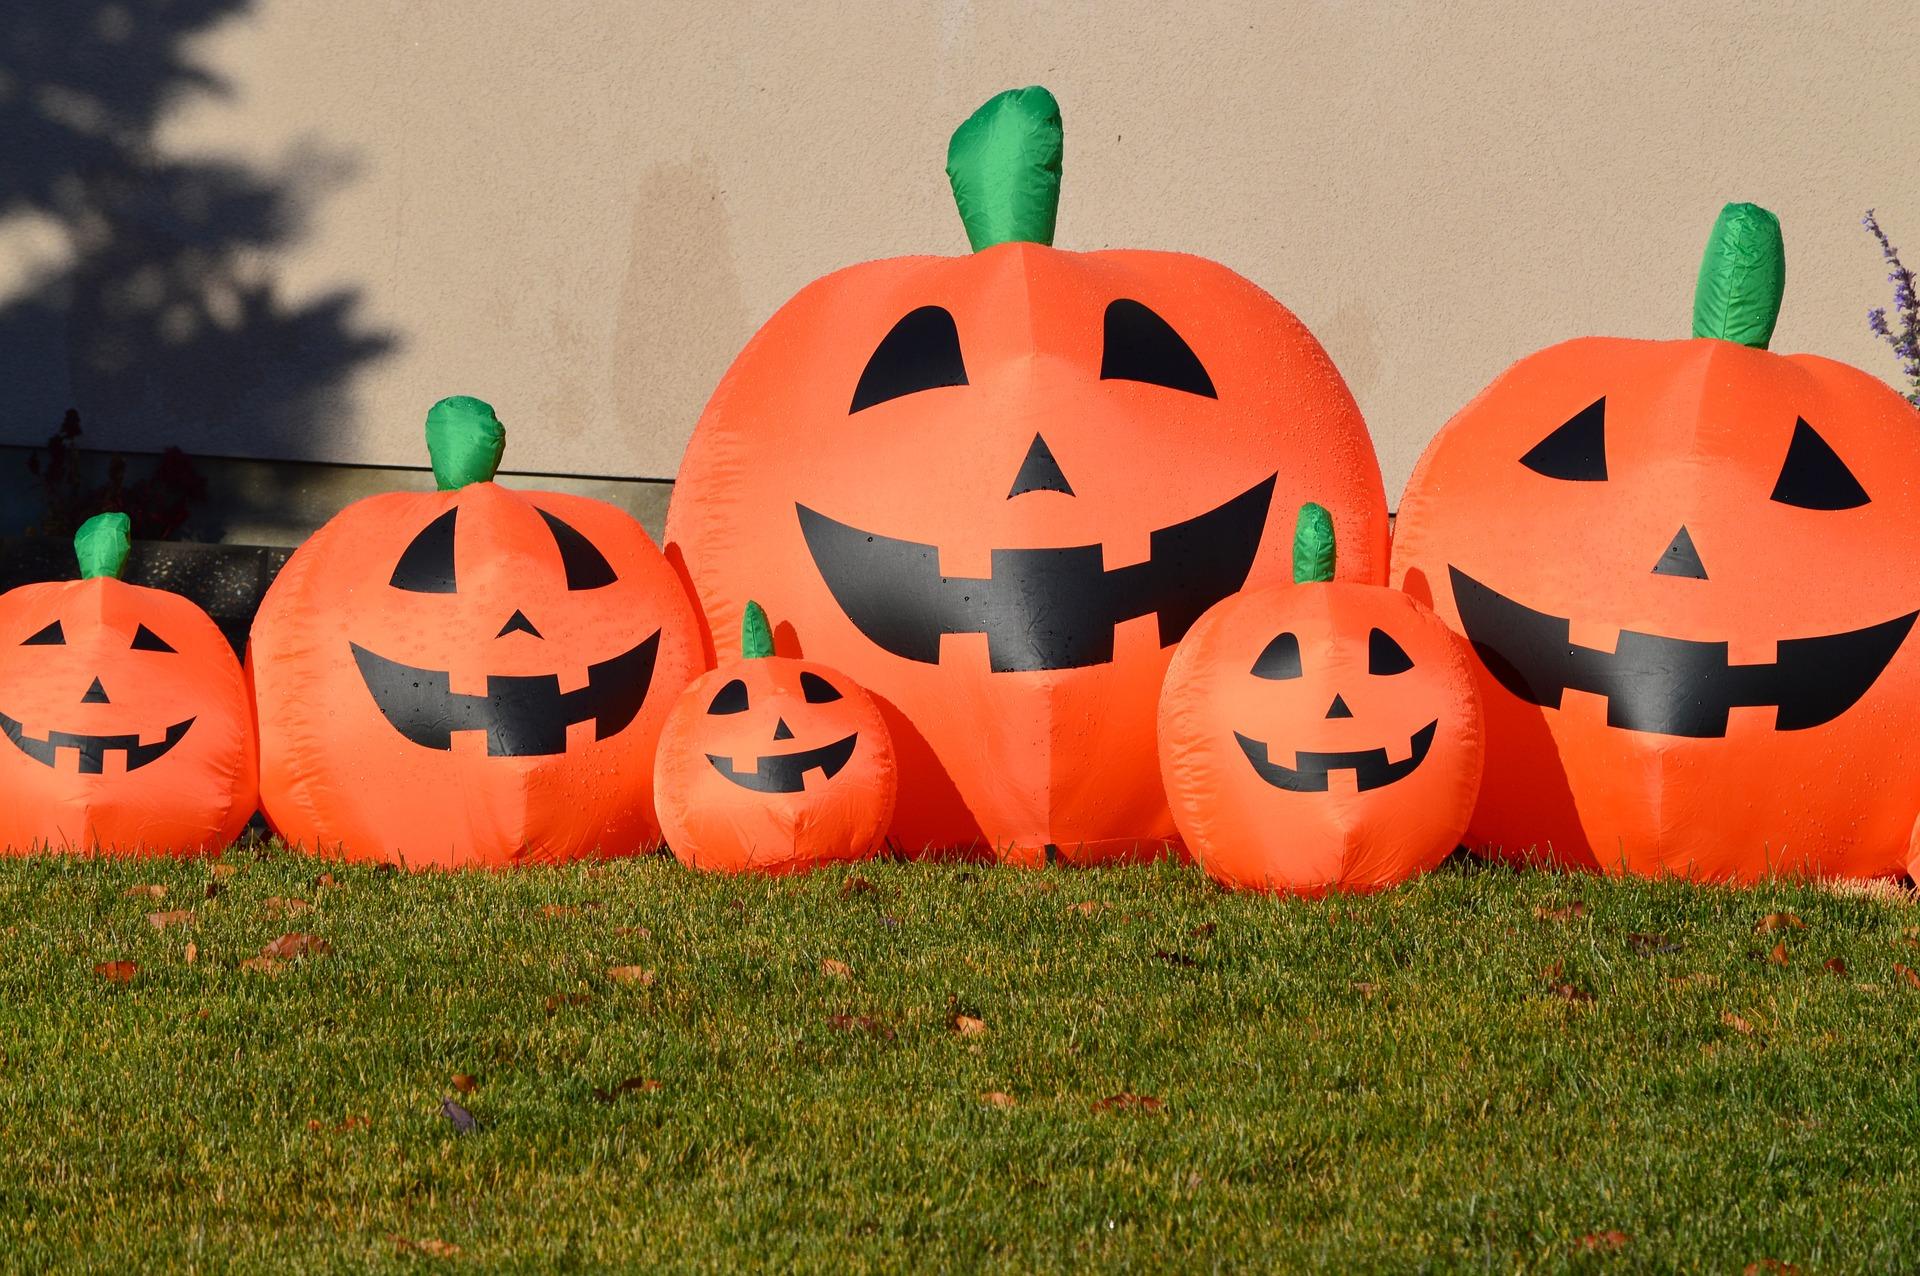 Trick or Treat? Finding the Fun in Halloween Again